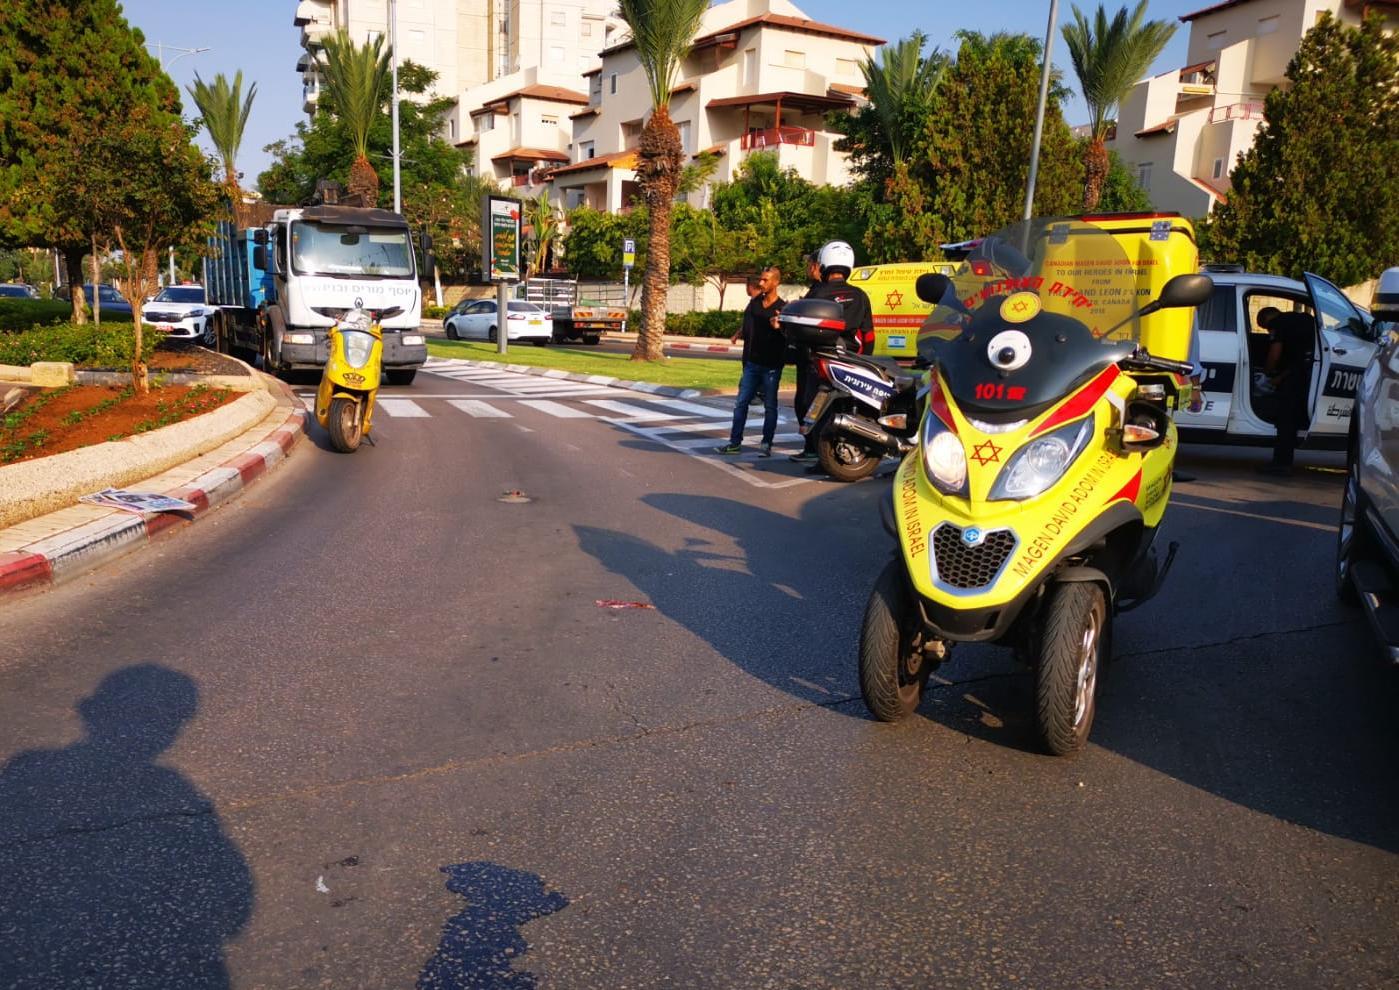 Photo of תאונת פגע וברח בשדרות בן גוריון באור יהודה. בן 60 במצב קשה מאוד. סריקות אחר הרכב הפוגע